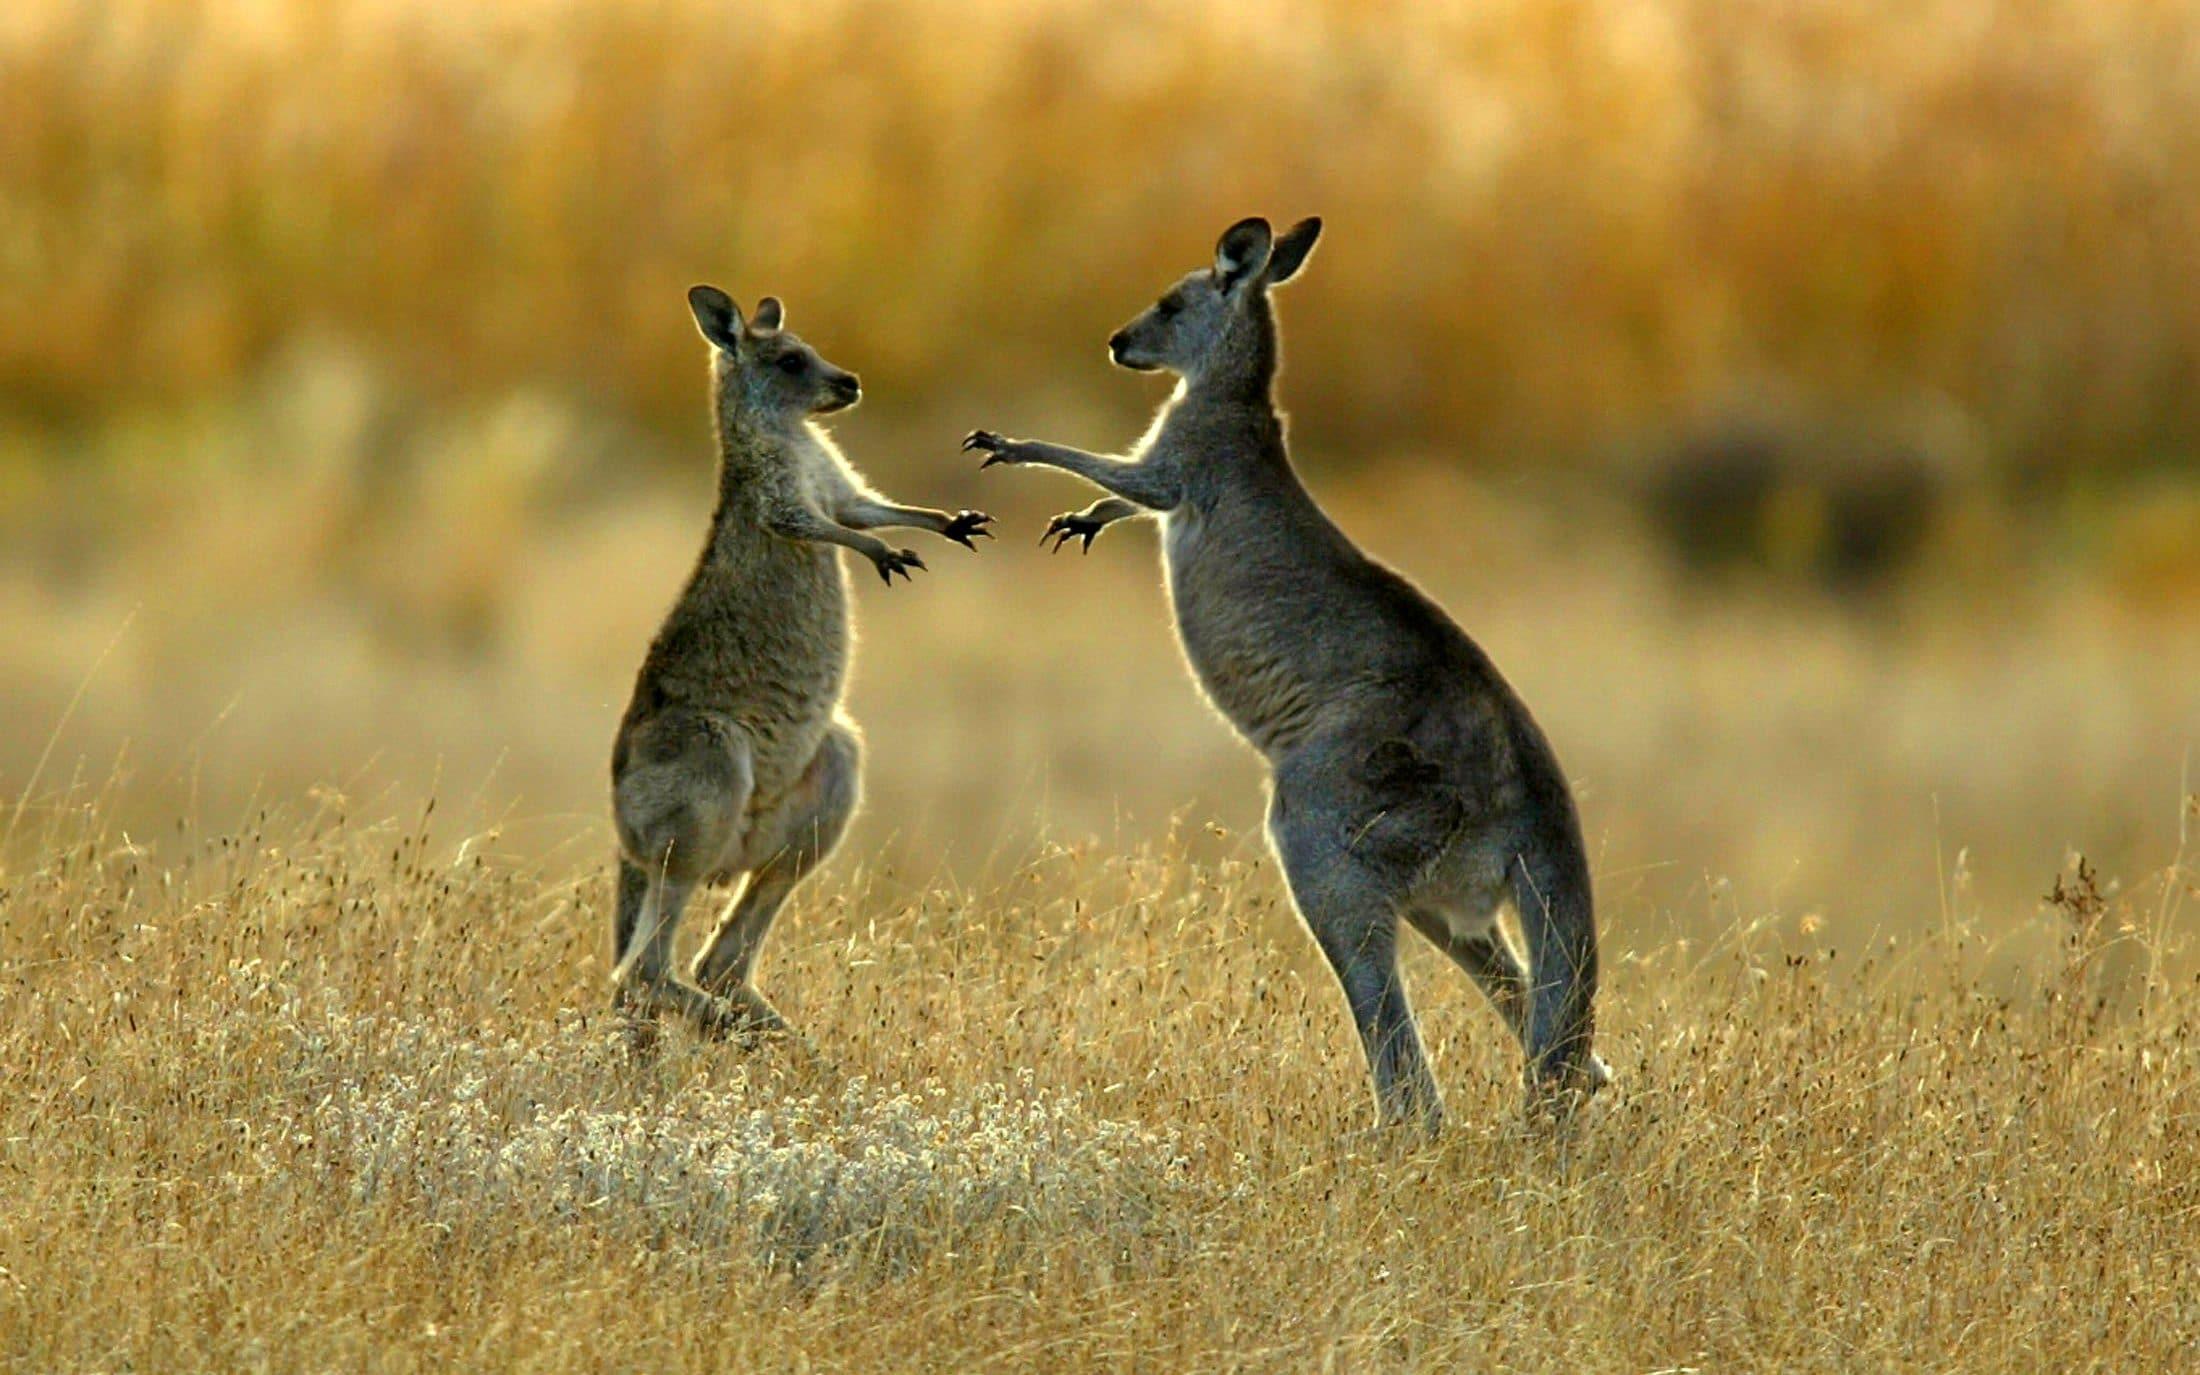 Versace renounces use of kangaroo leather as millions of marsupials die in Australian bush fires